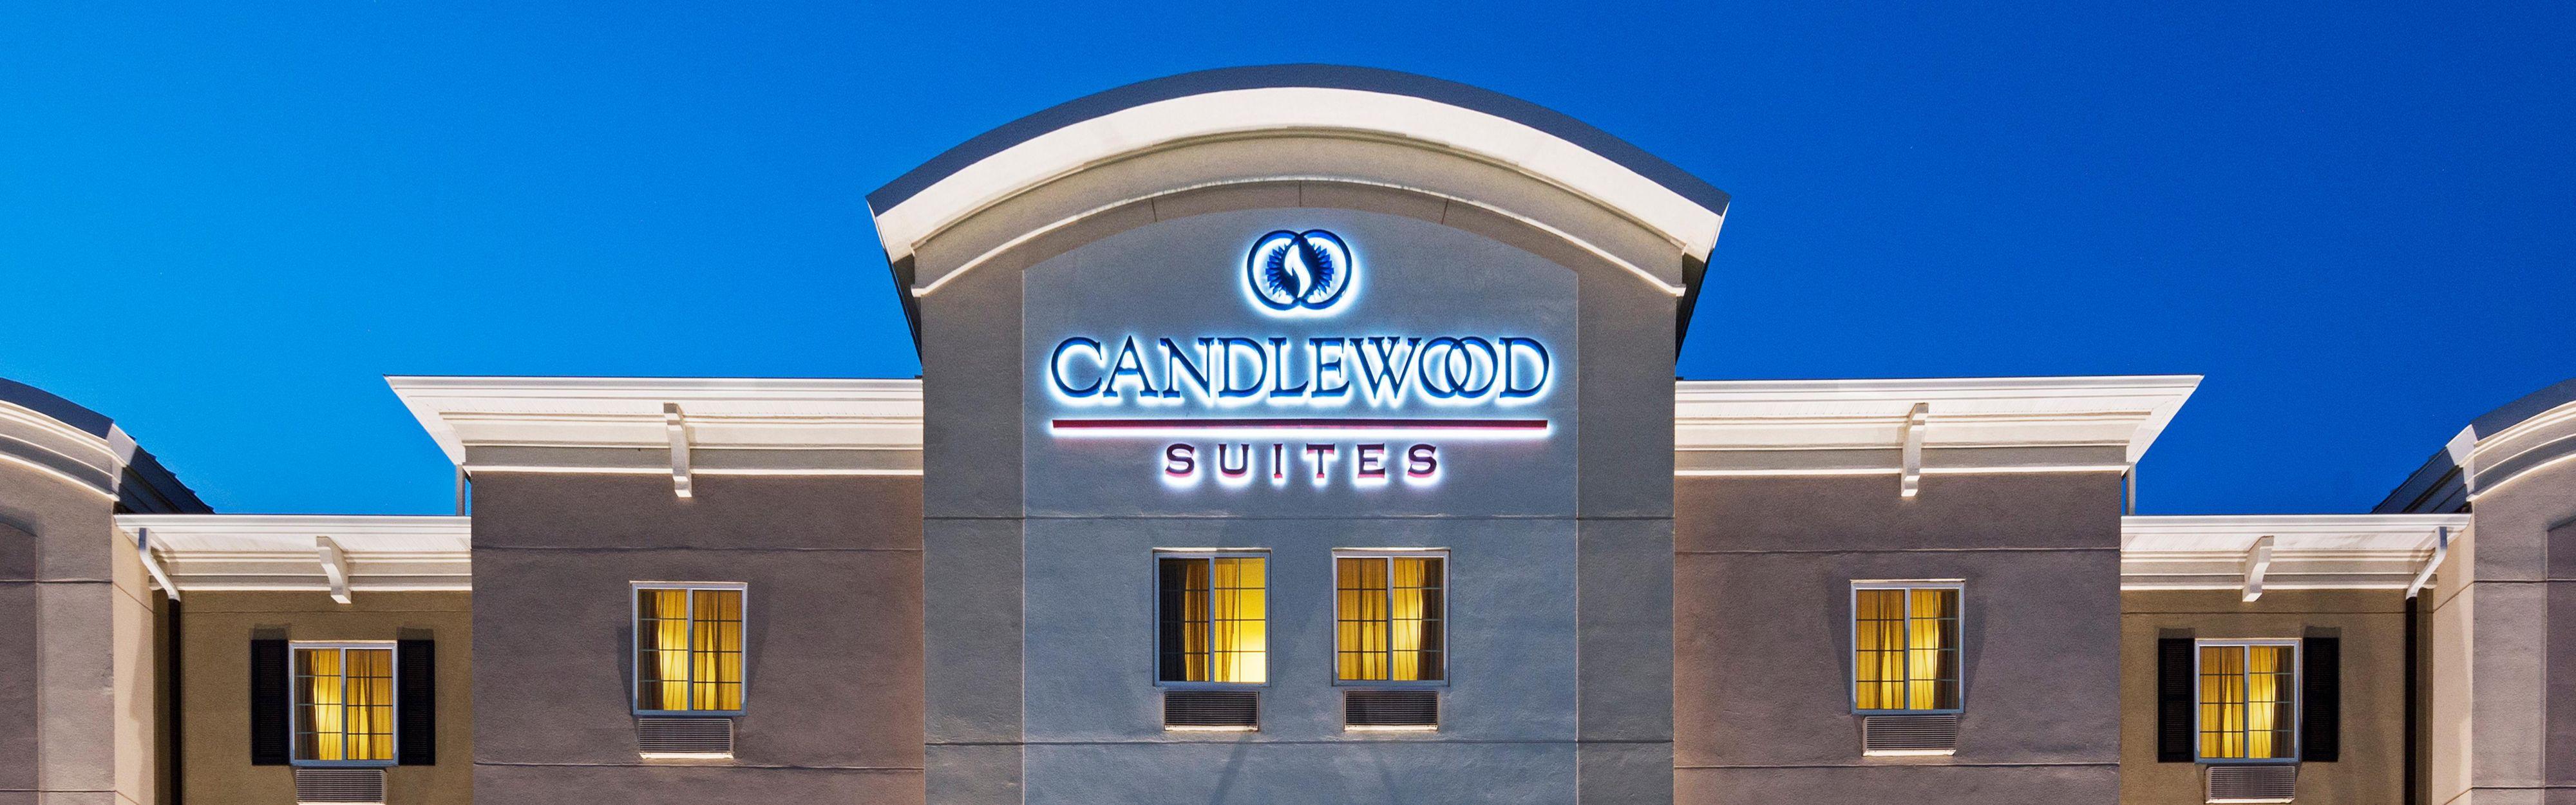 Candlewood Suites Longmont image 0